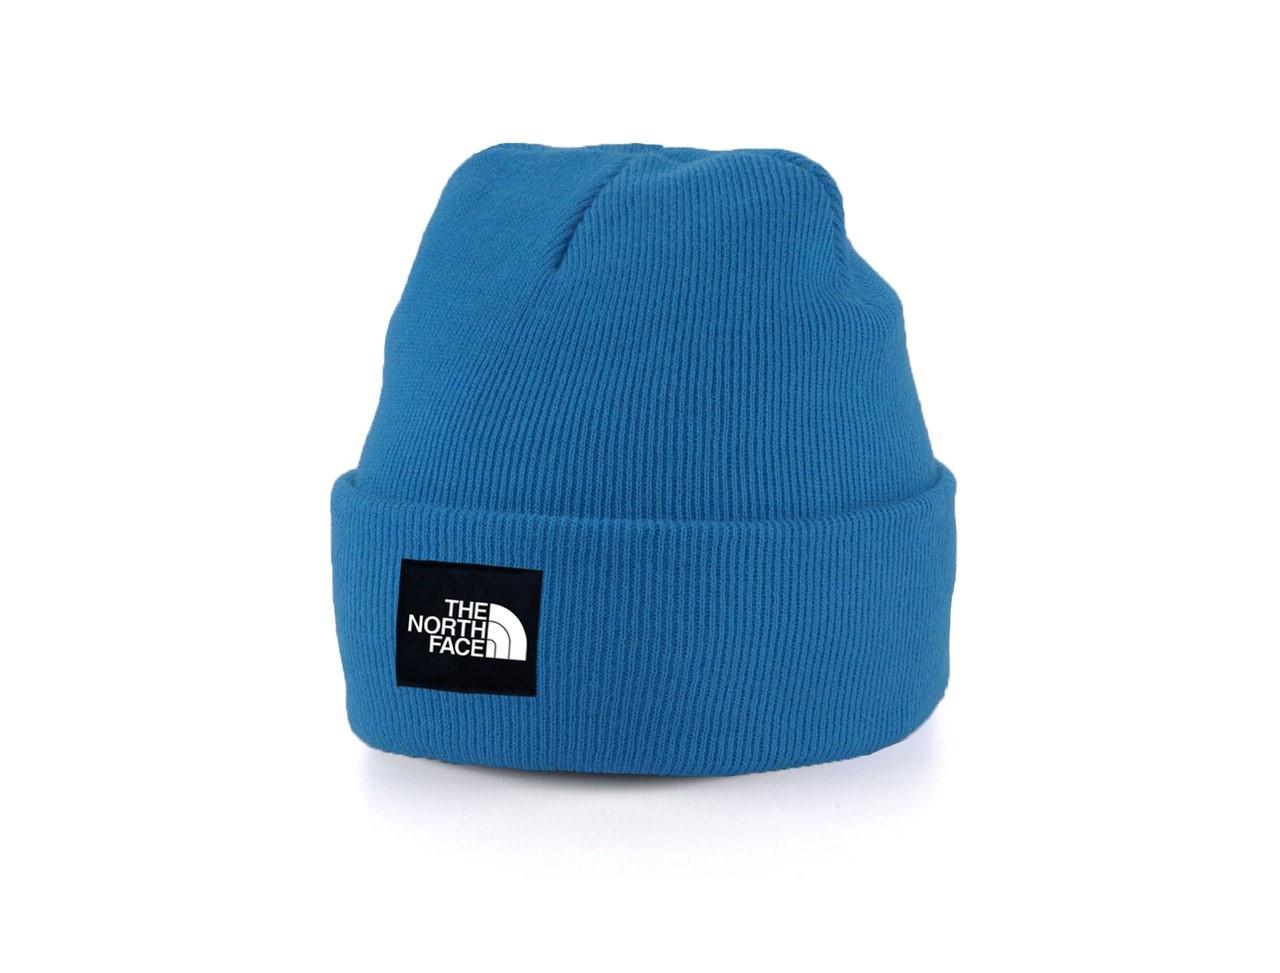 Мужская теплая шапка The North Face универсальный размер